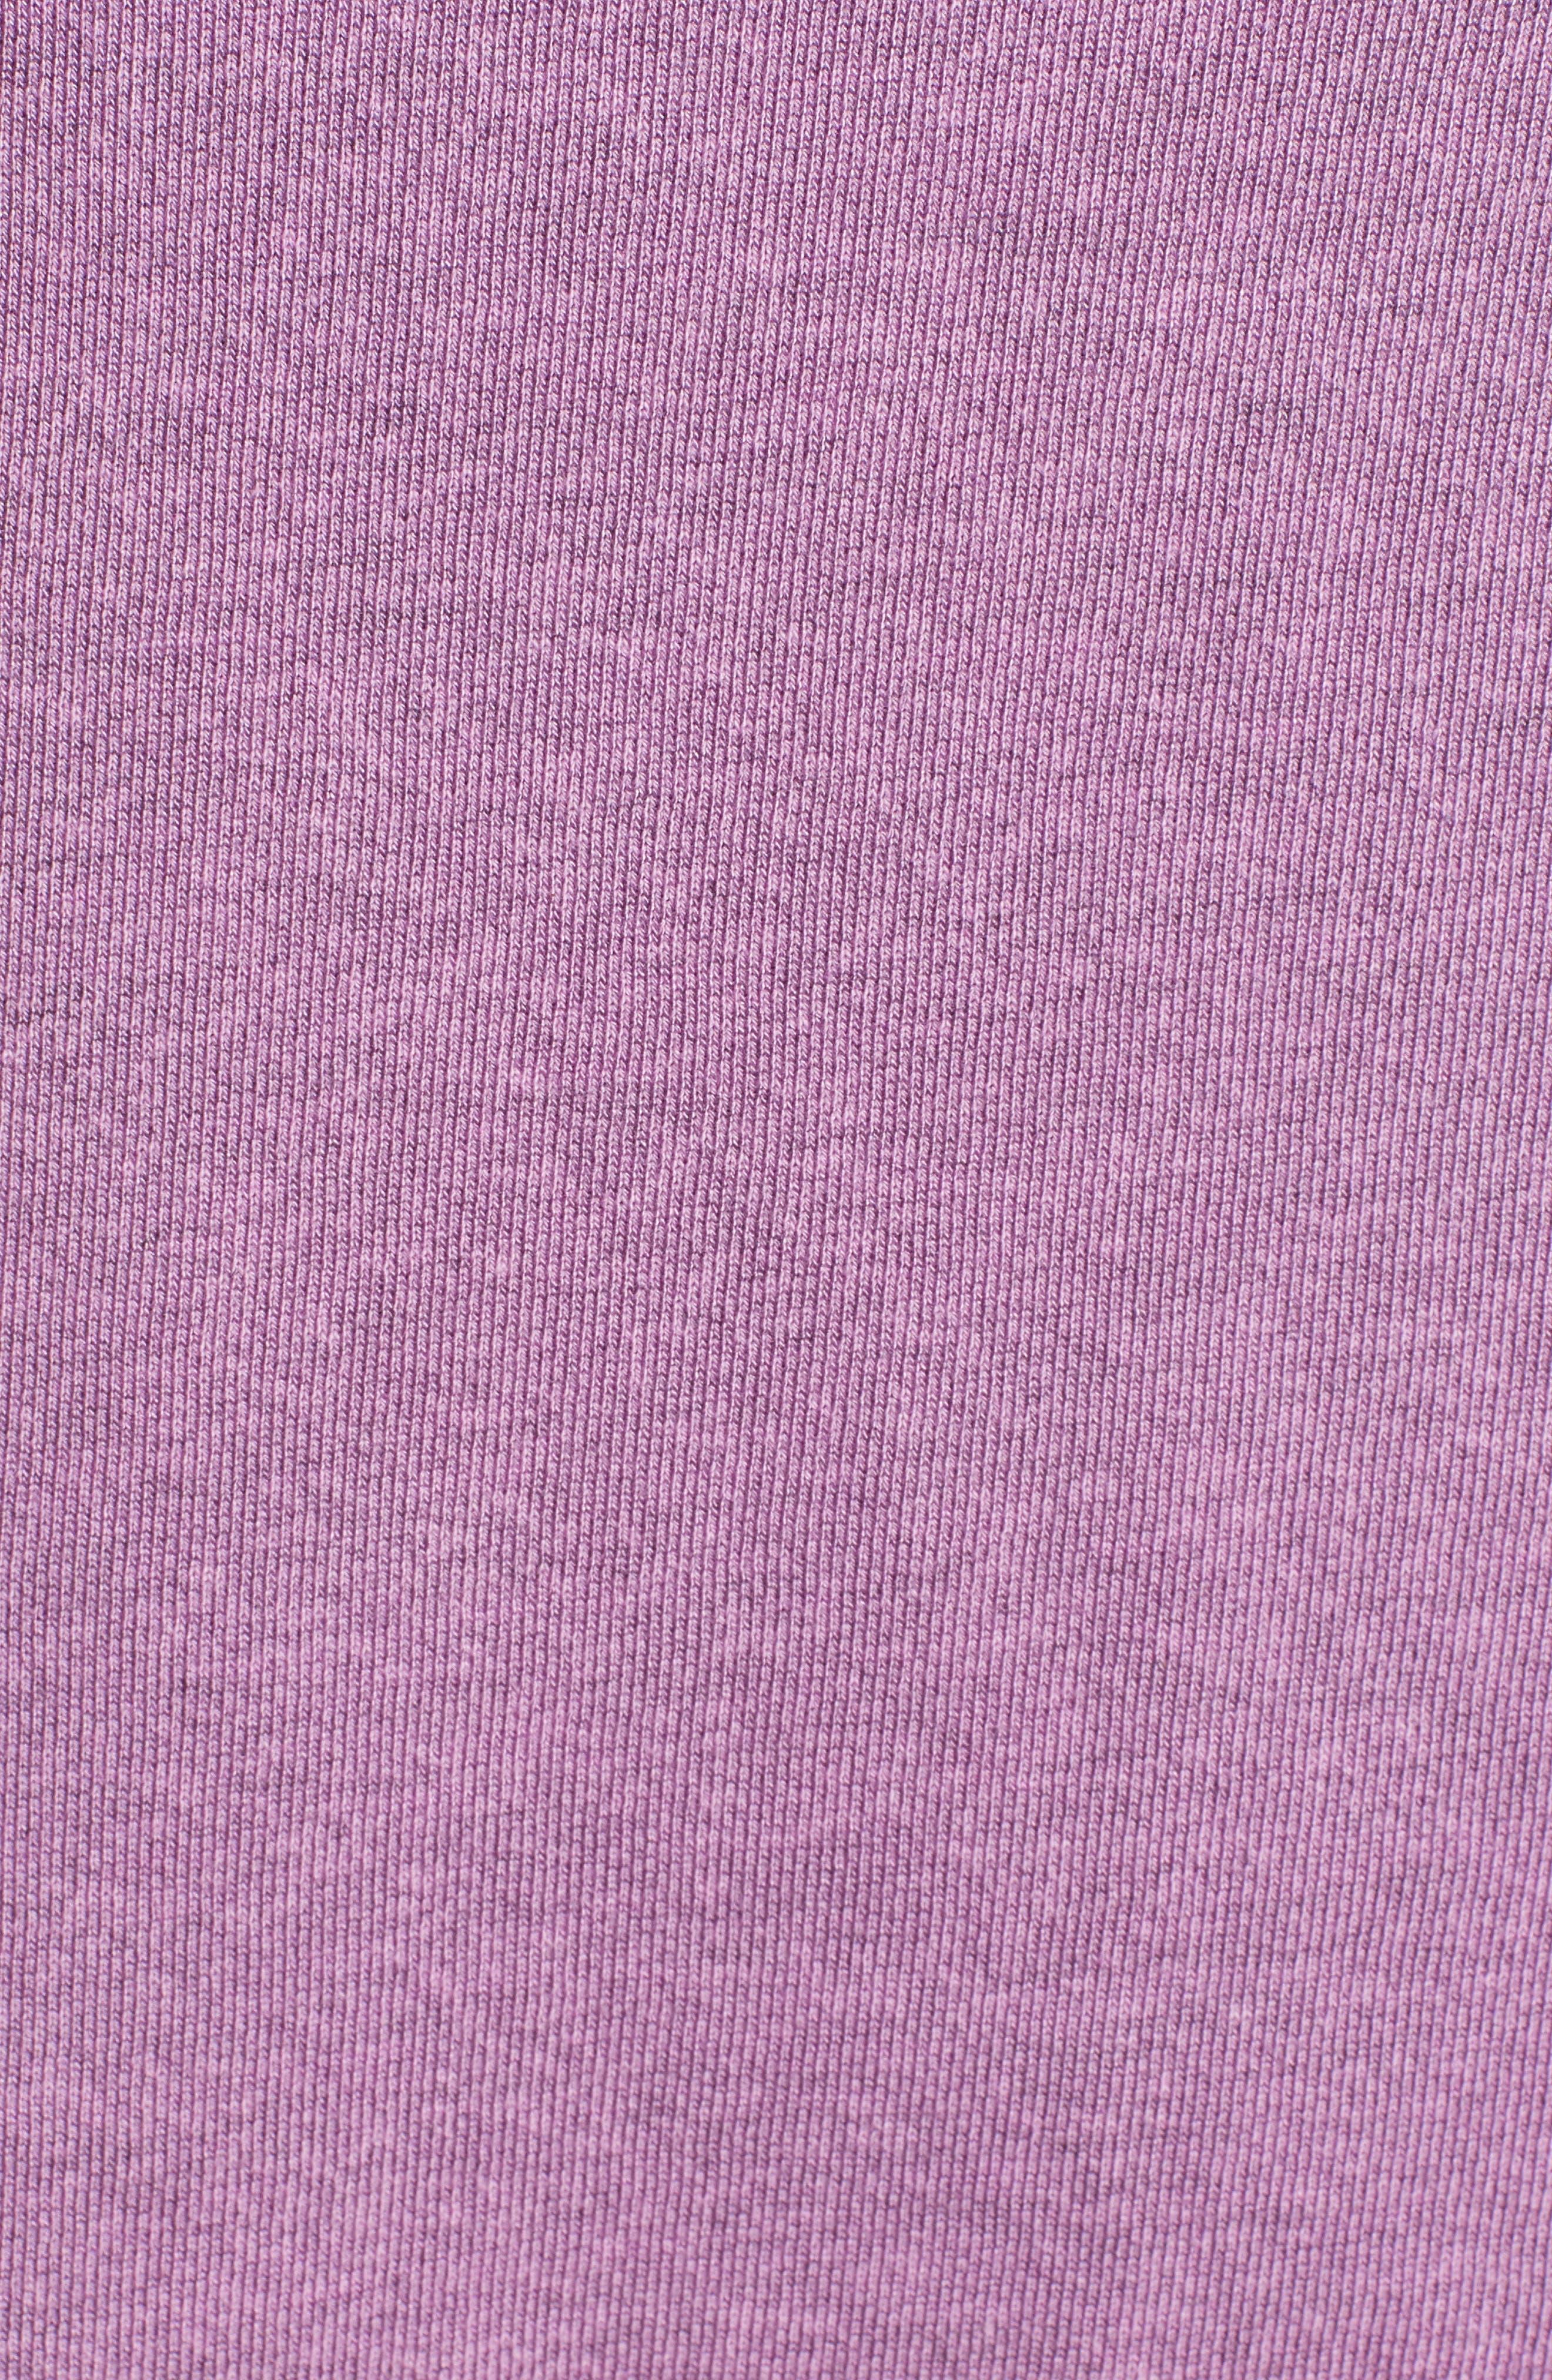 Faded Print Sweatshirt,                             Alternate thumbnail 5, color,                             525